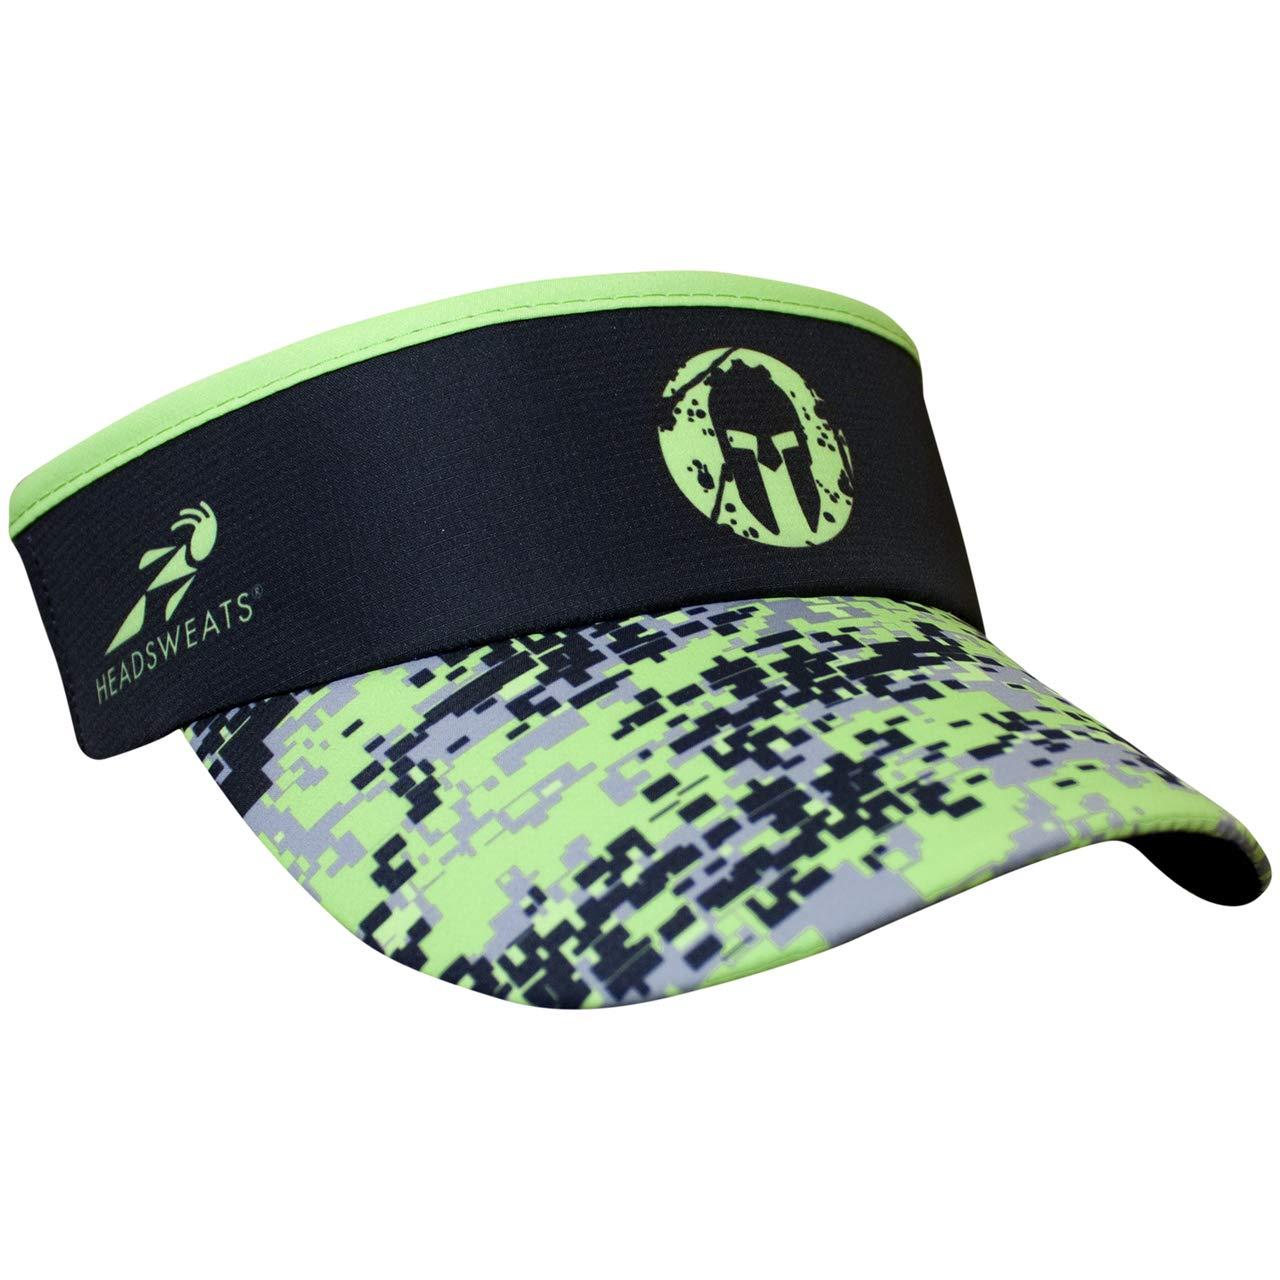 Spartan Camouflage Headsweats Supervisor Sun Visor 22703 401sCamo